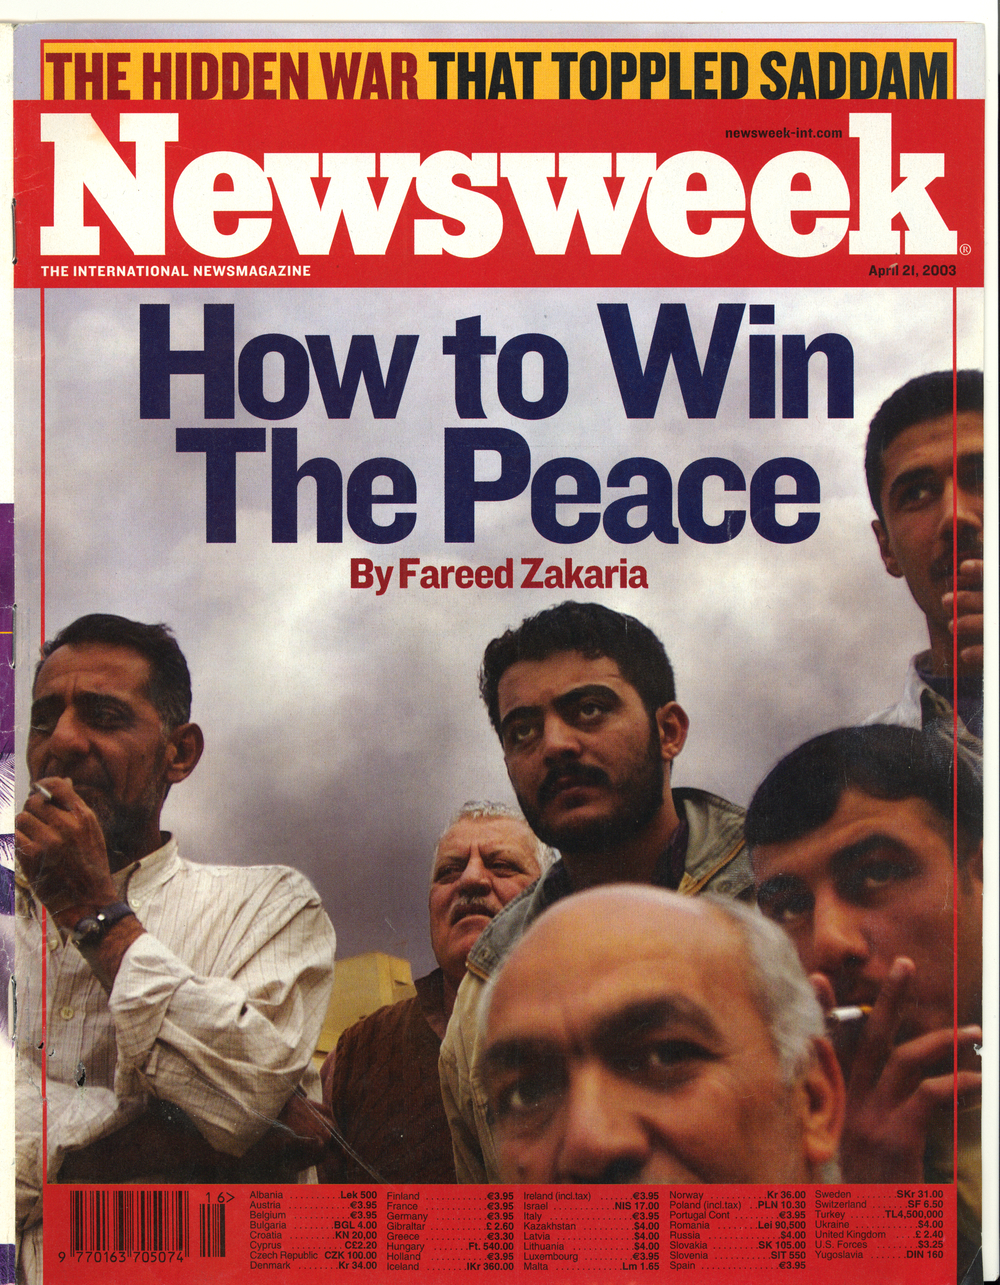 04212003_NEWSWEEK_IRAQ_COVER.jpg